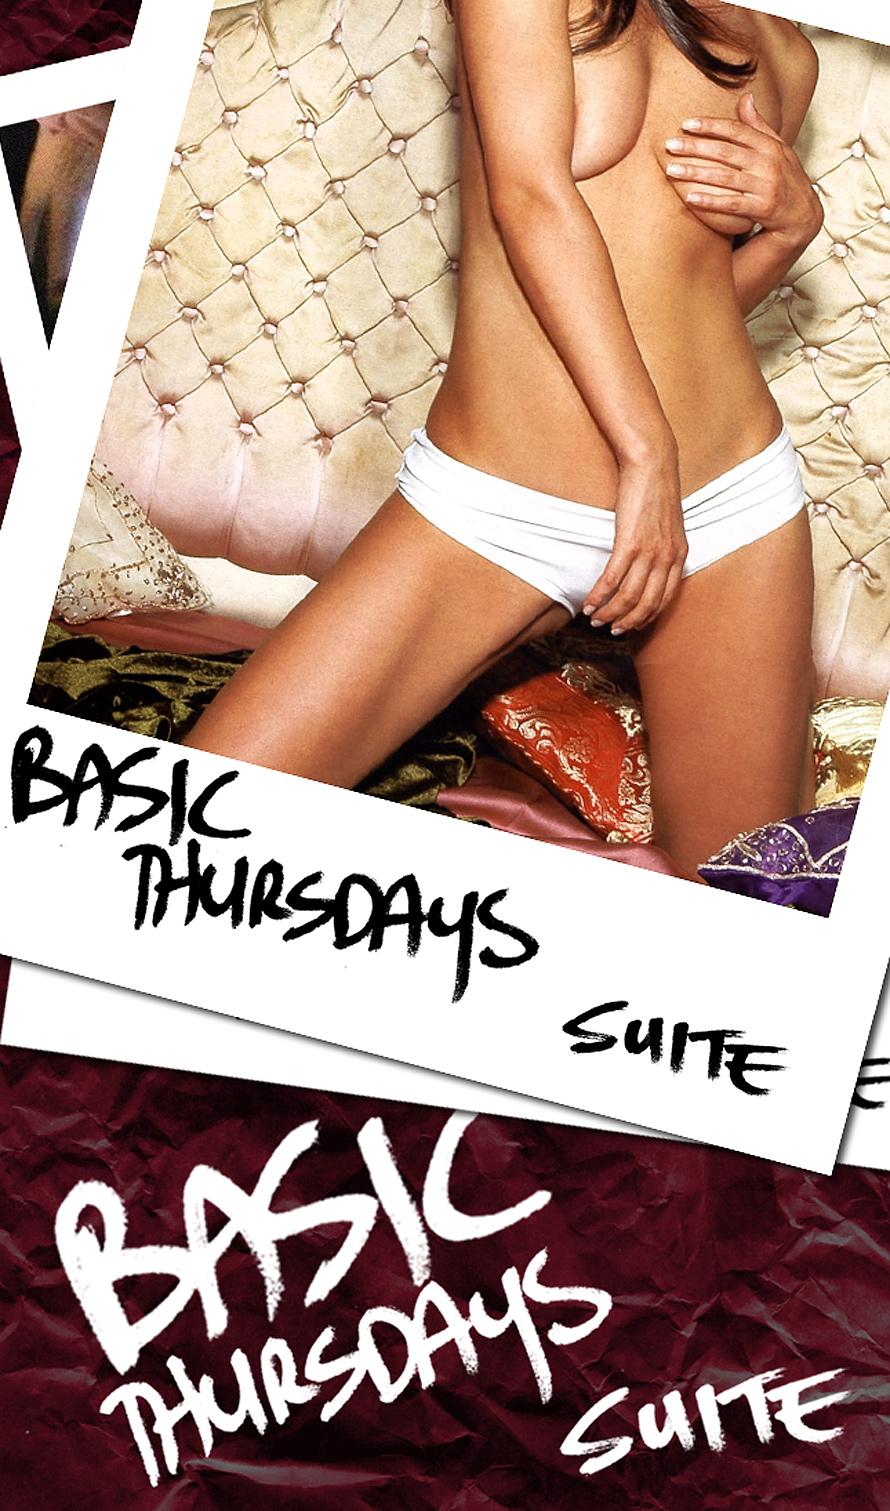 Basic Thursdays at Suite Nightclub